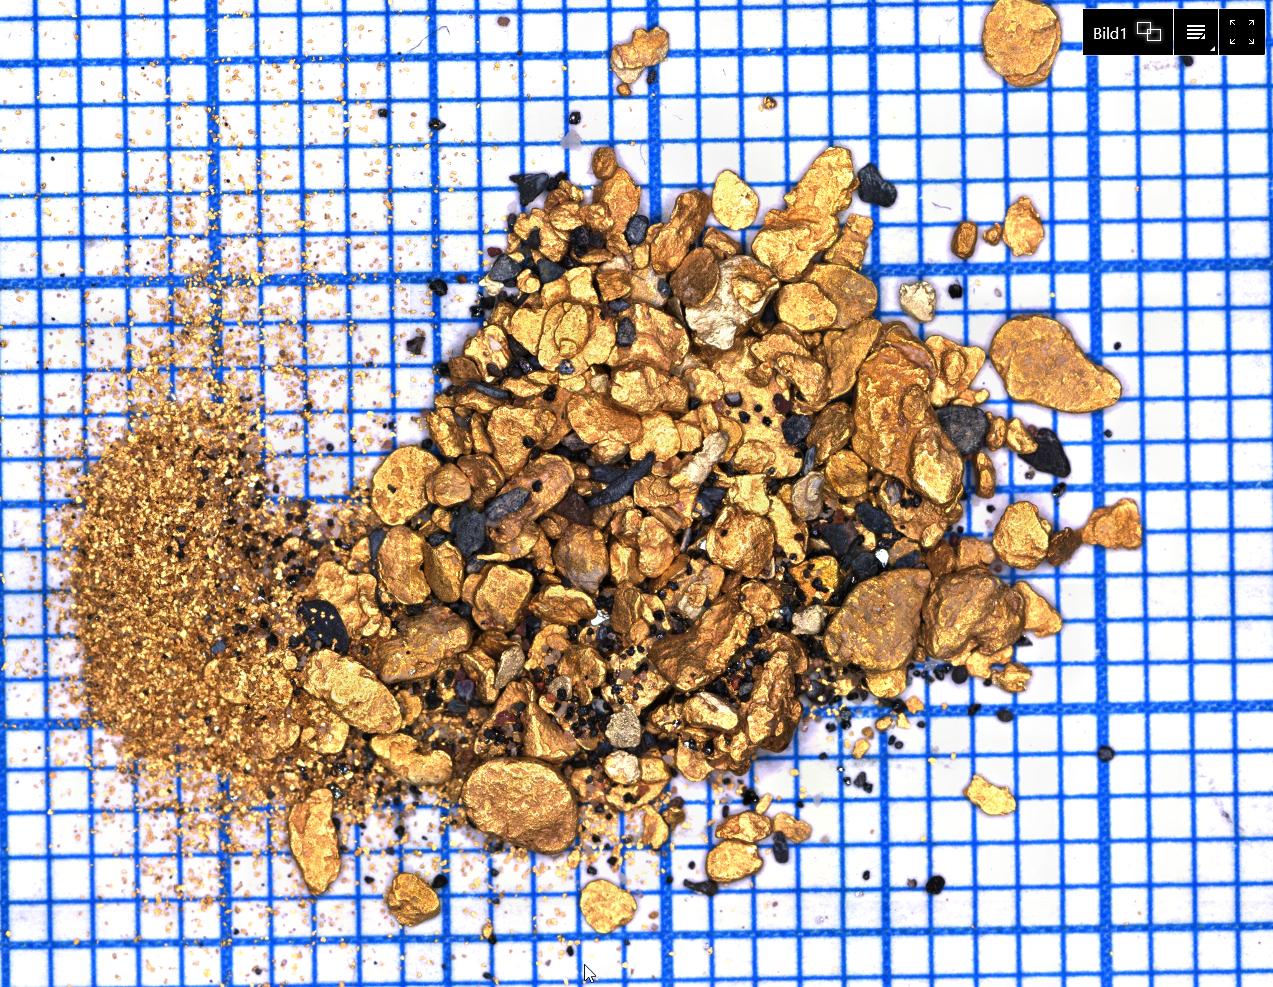 Goldbandbreite - Torsten Marx